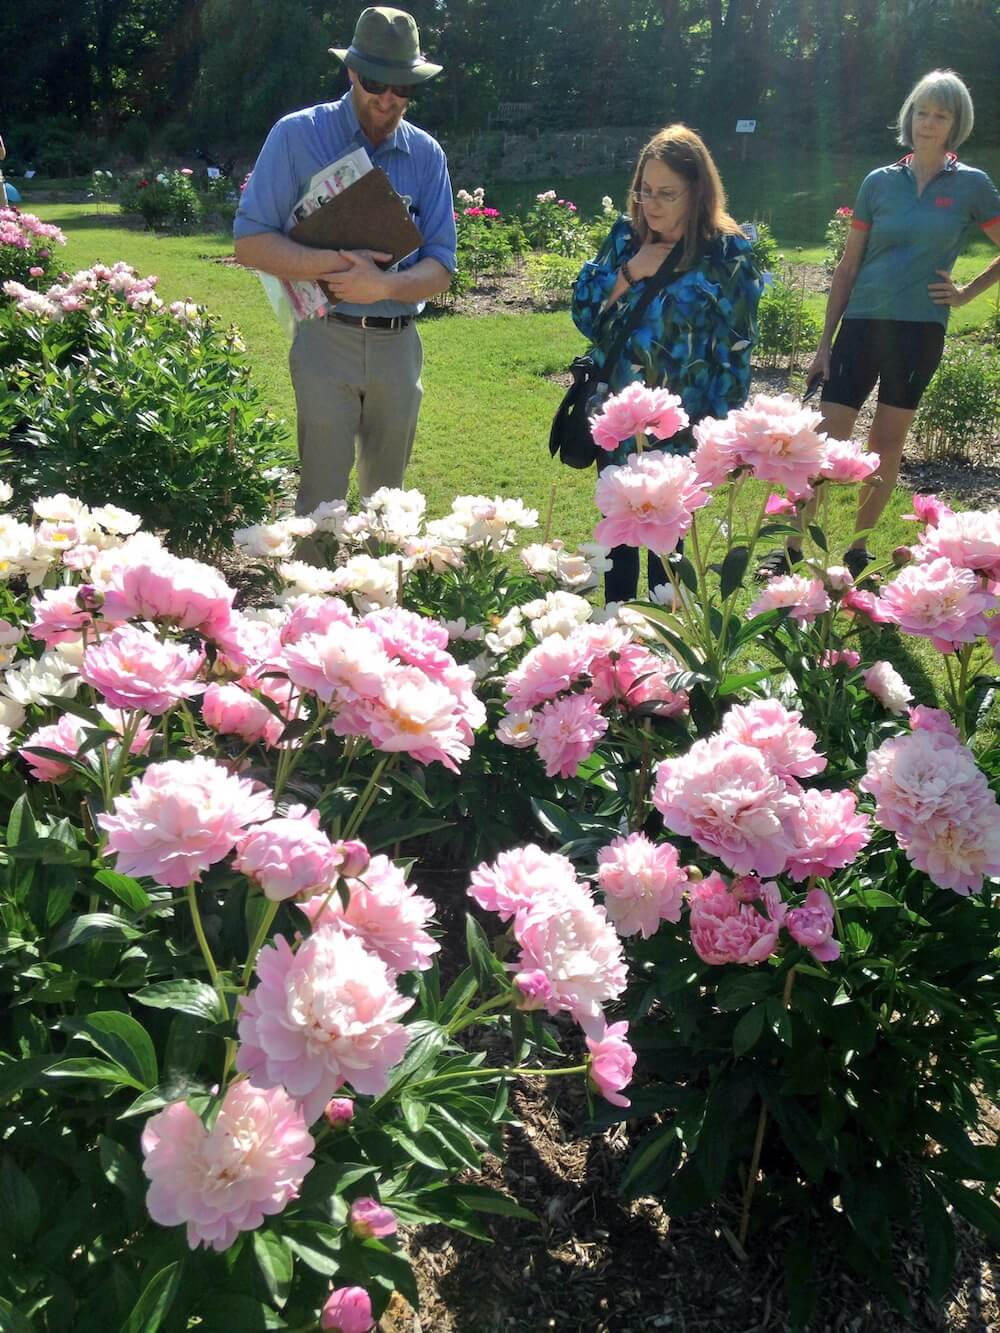 Peony Garden, Nichols Arboretum, Ann Arbor, Mich. Credit: GTM/David Hoekman